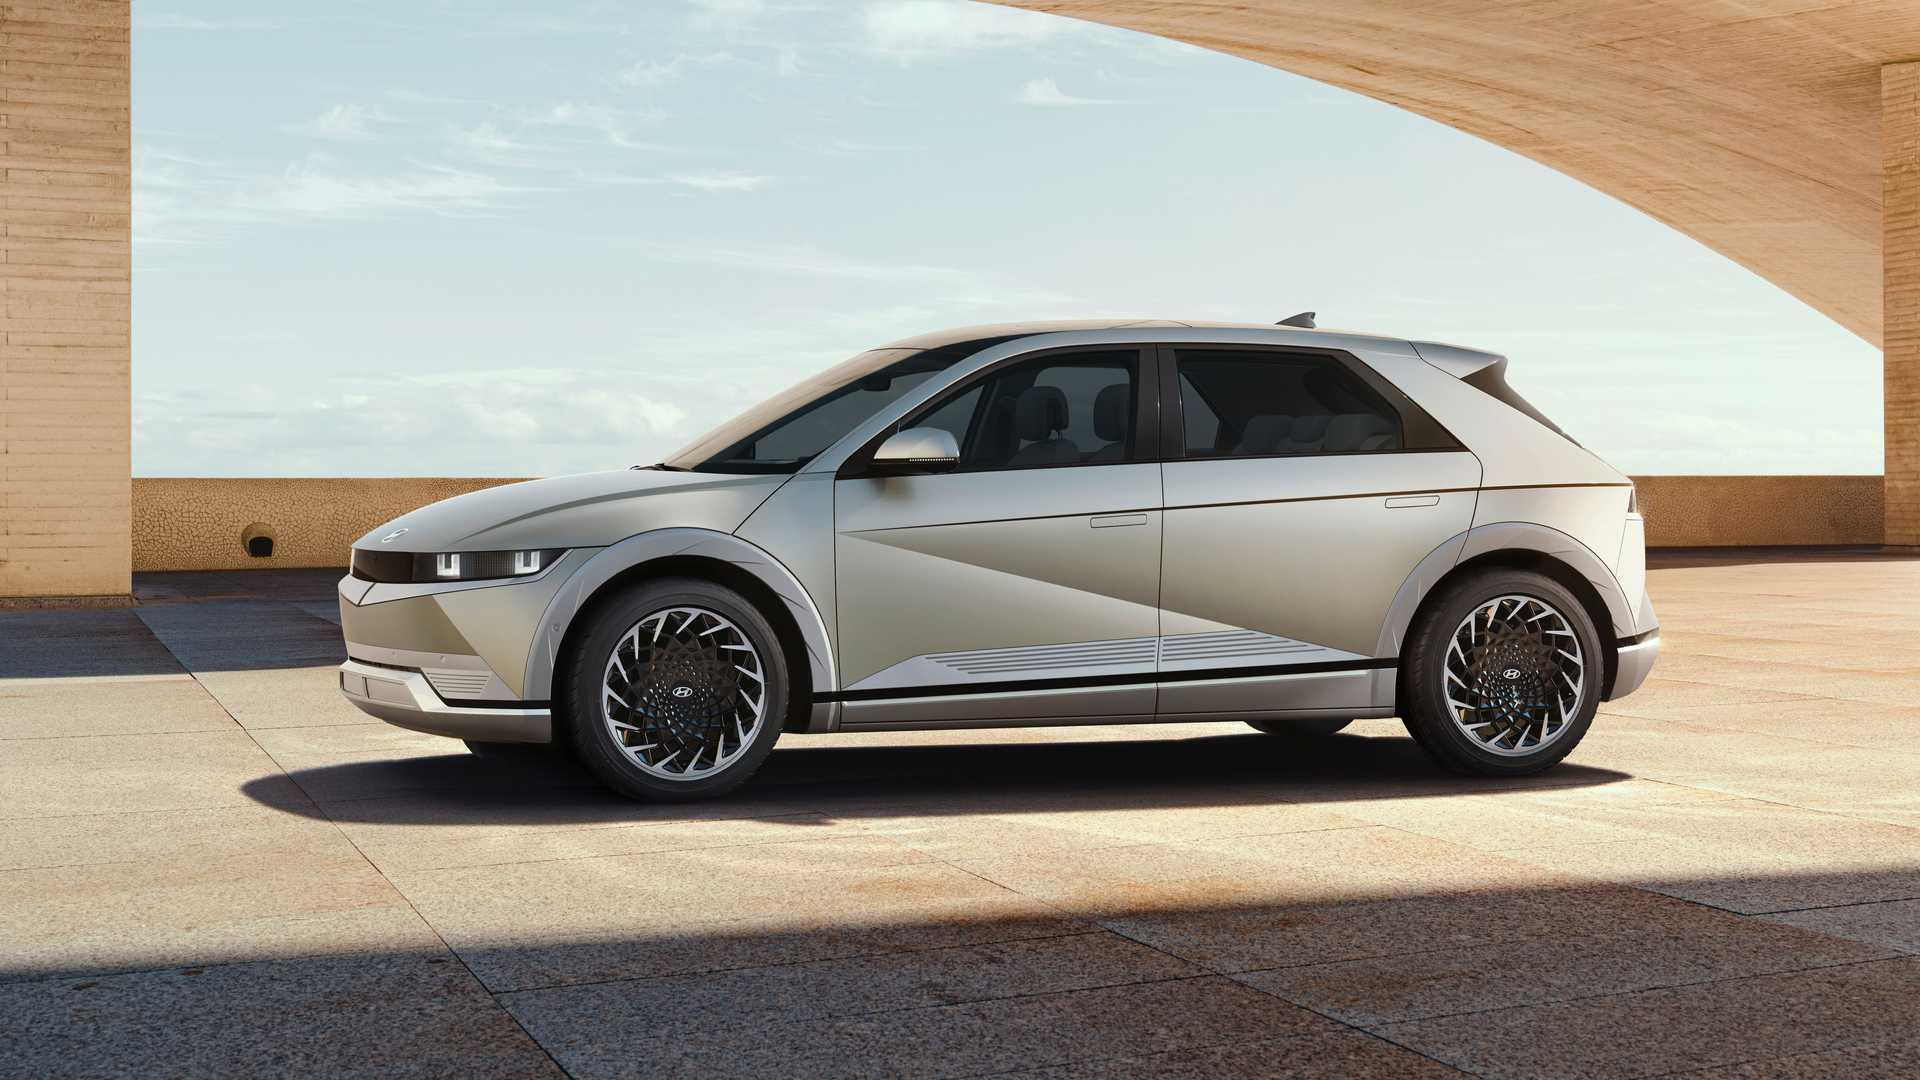 Hyundai Ioniq 5 Side View